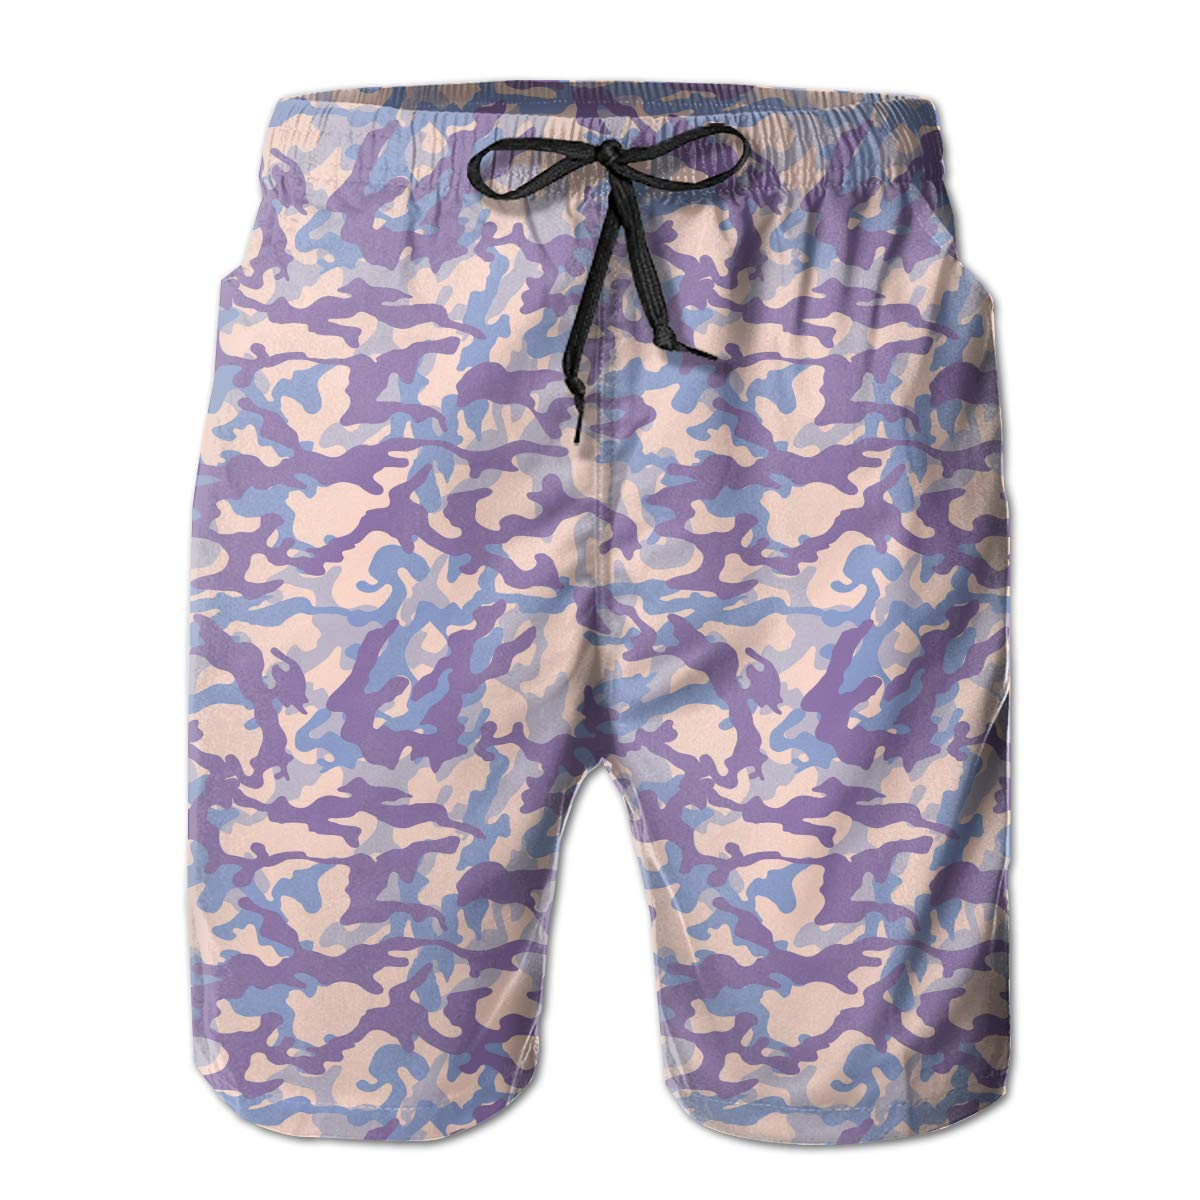 Fashion Swim Trunks Mens Board Shorts Salmon Fashionable Camouflage Purple Quick Dry Shorts